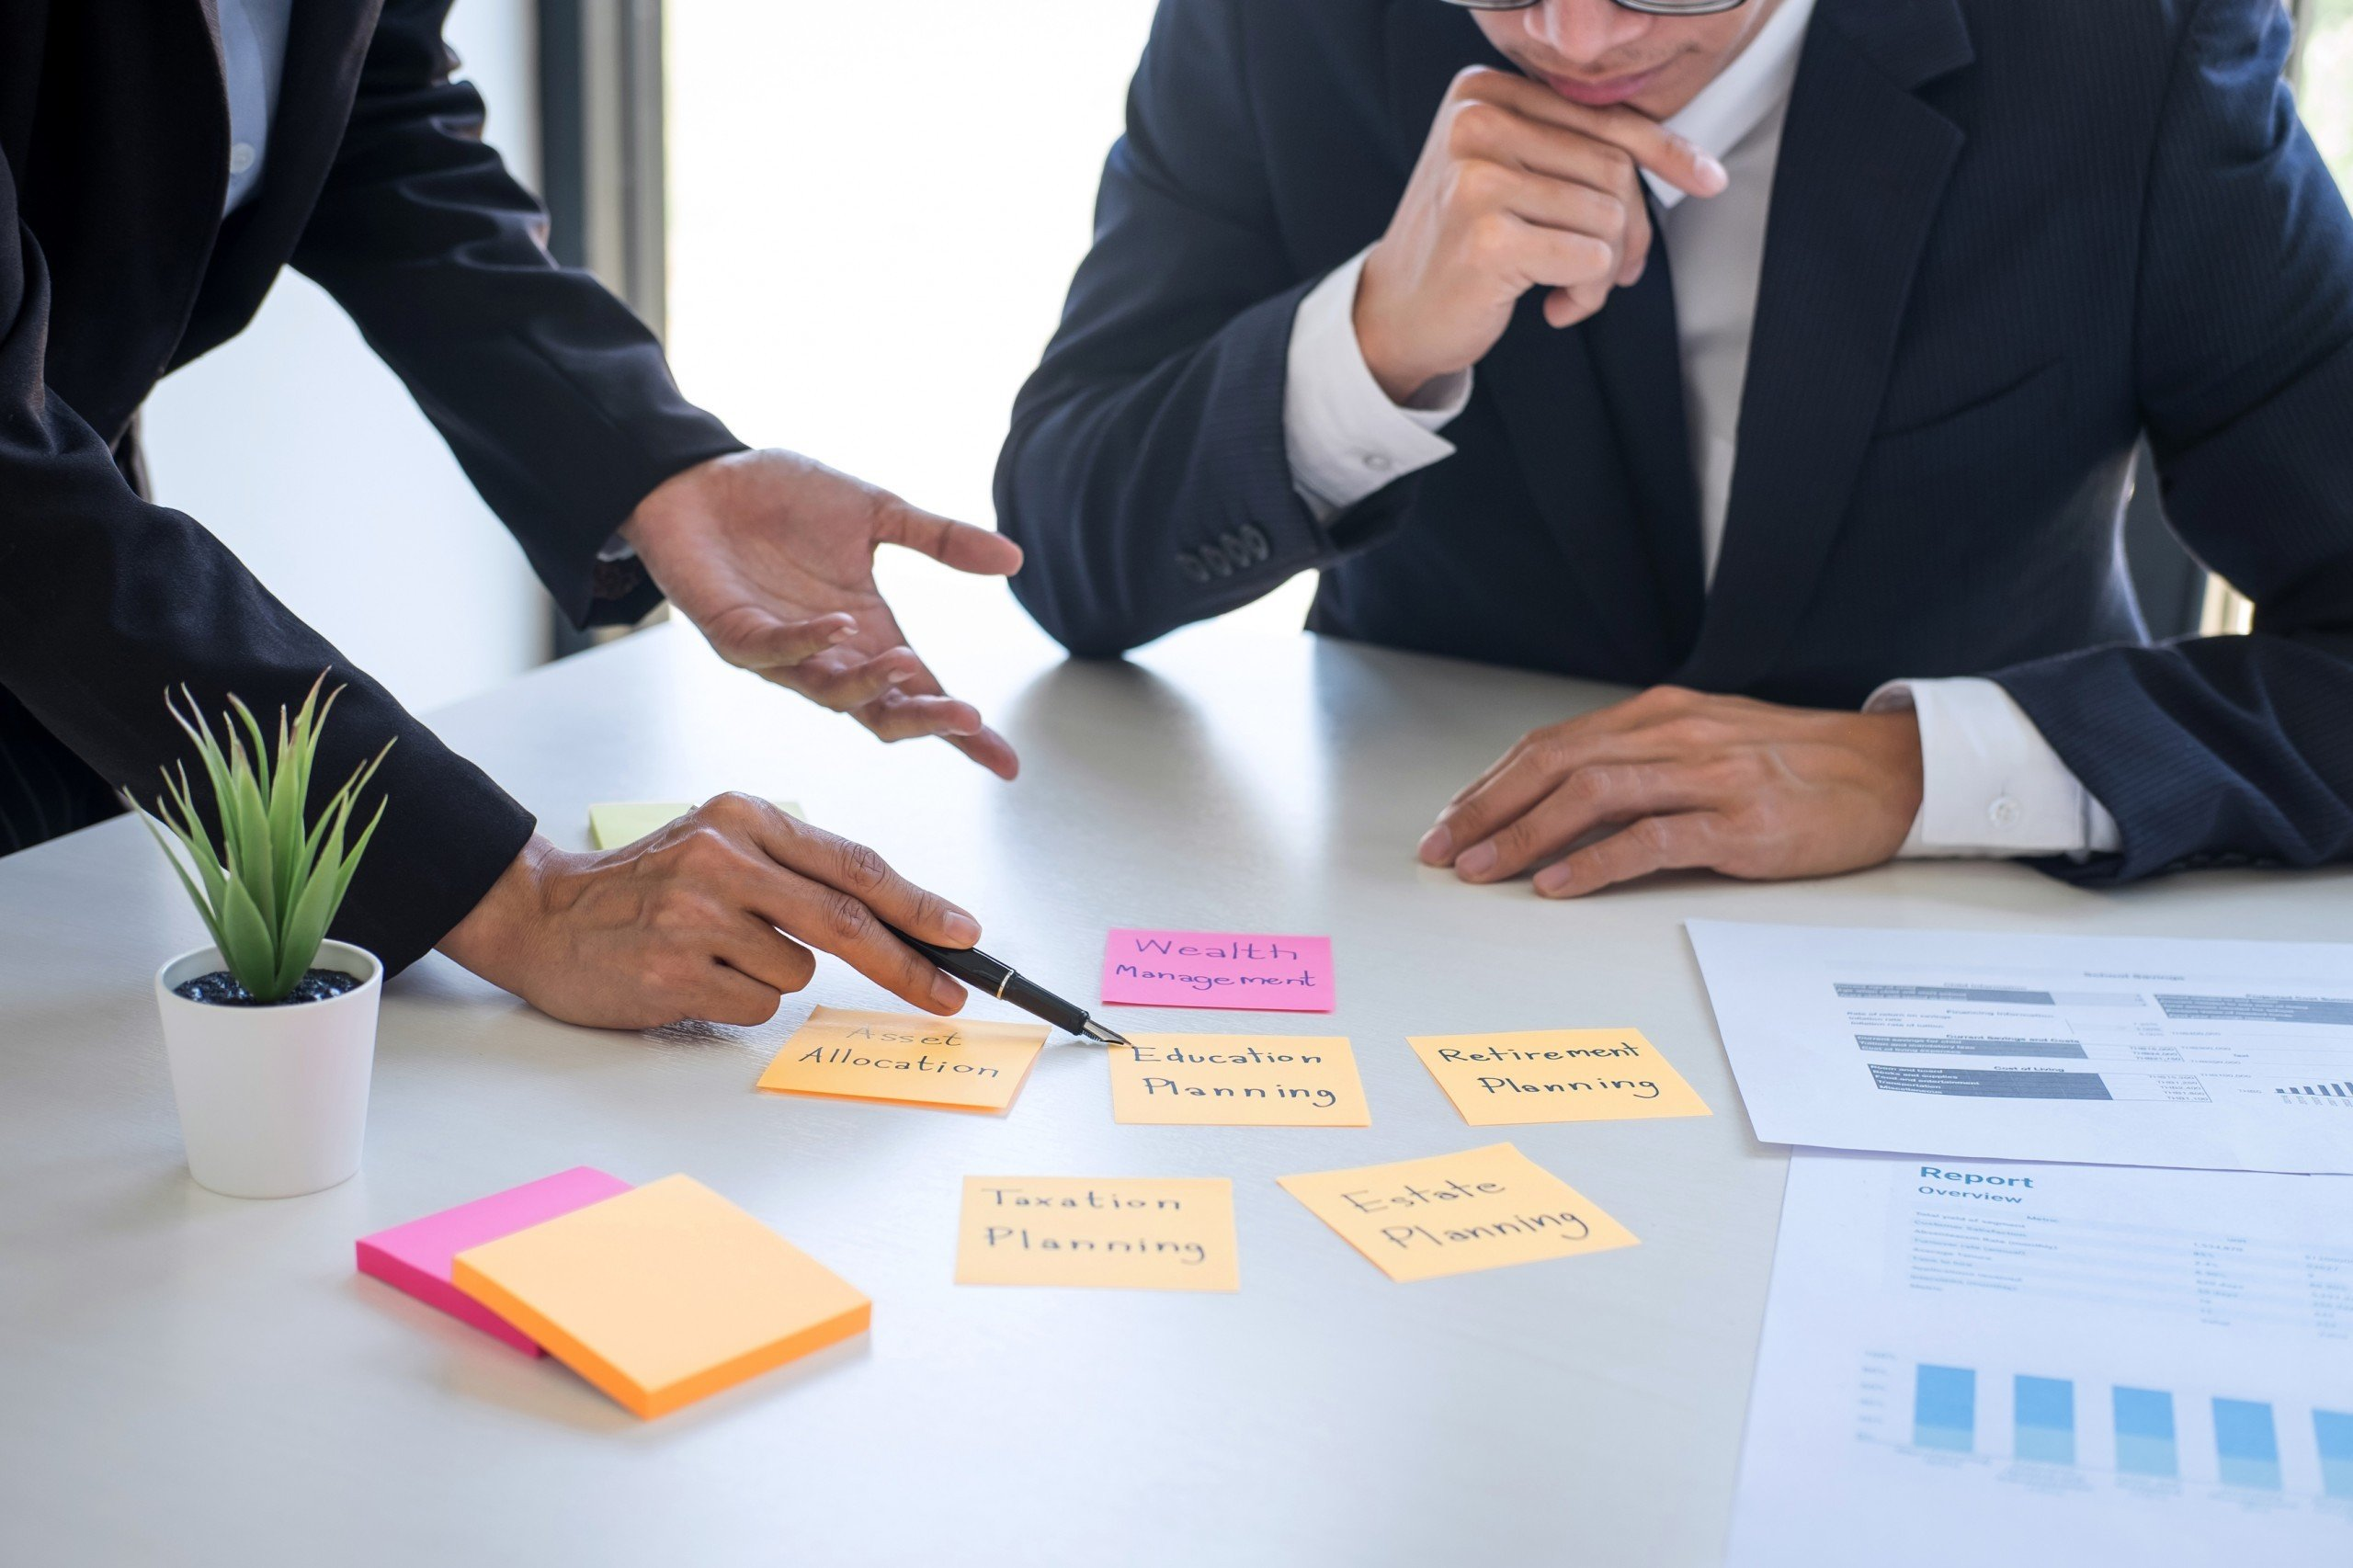 Wealth management product